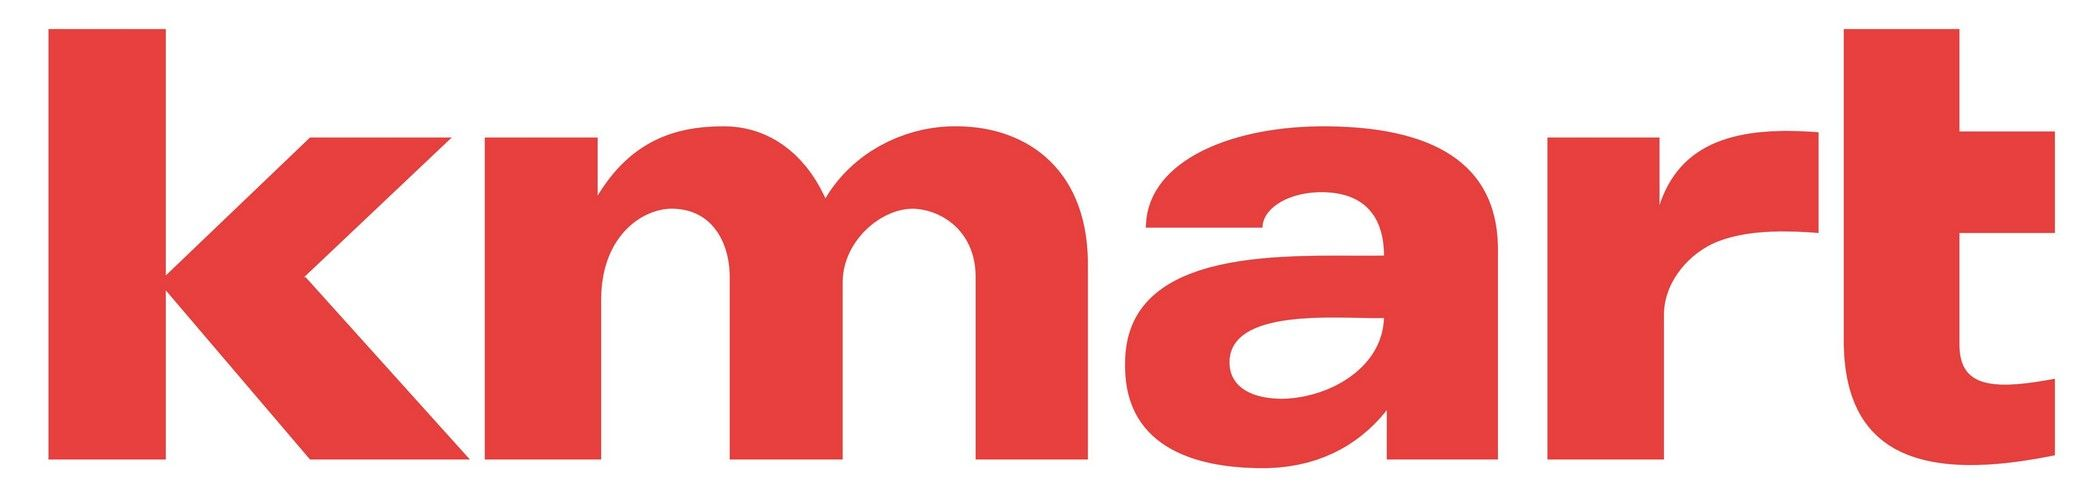 Kmart Logo 2015